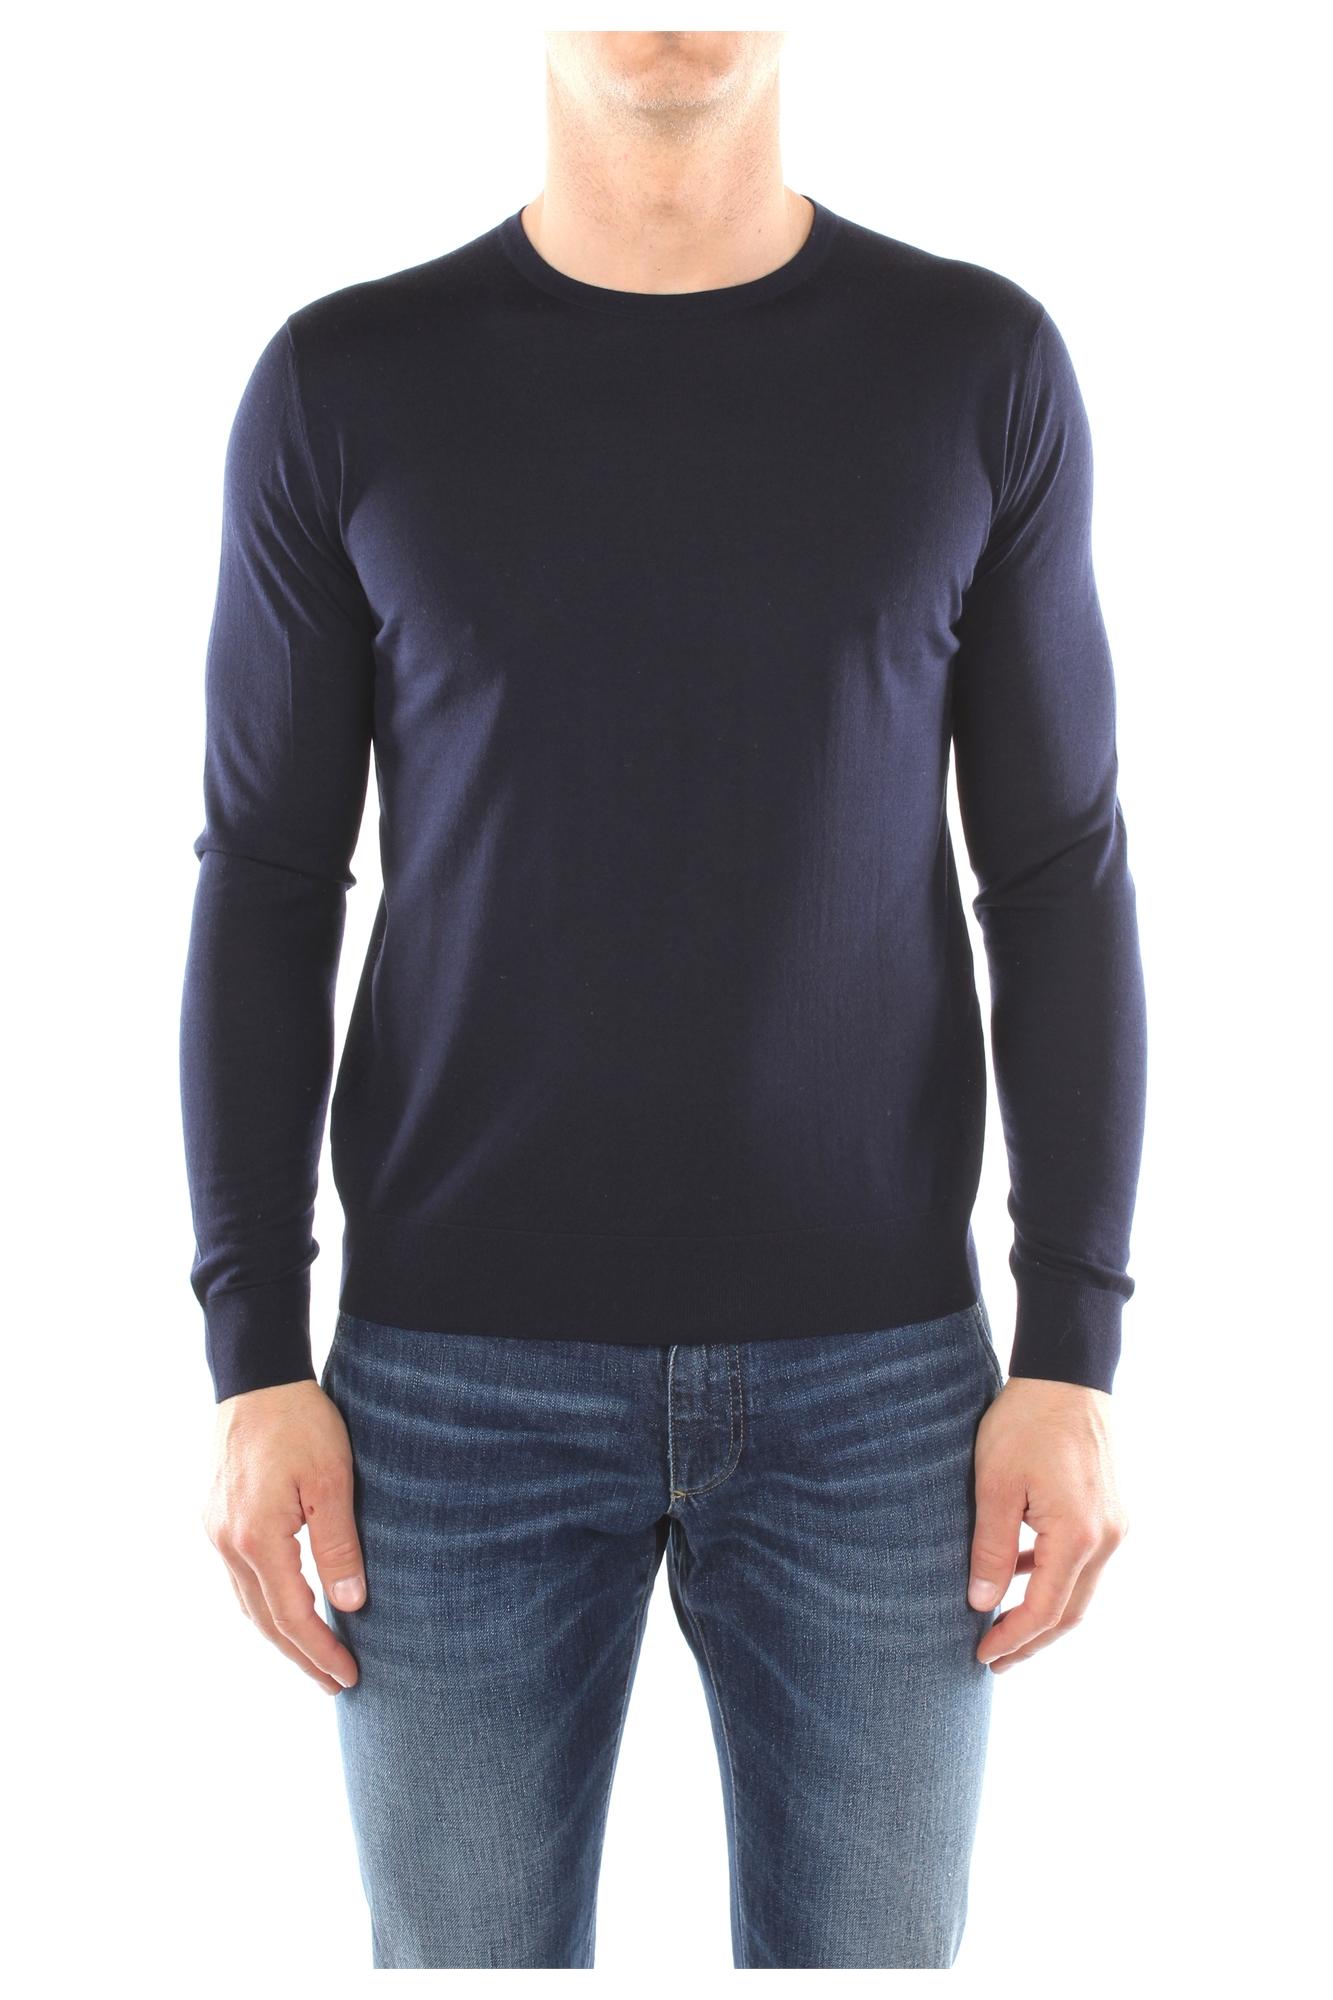 Pullover-Prada-Uomo-UMM984NAVY